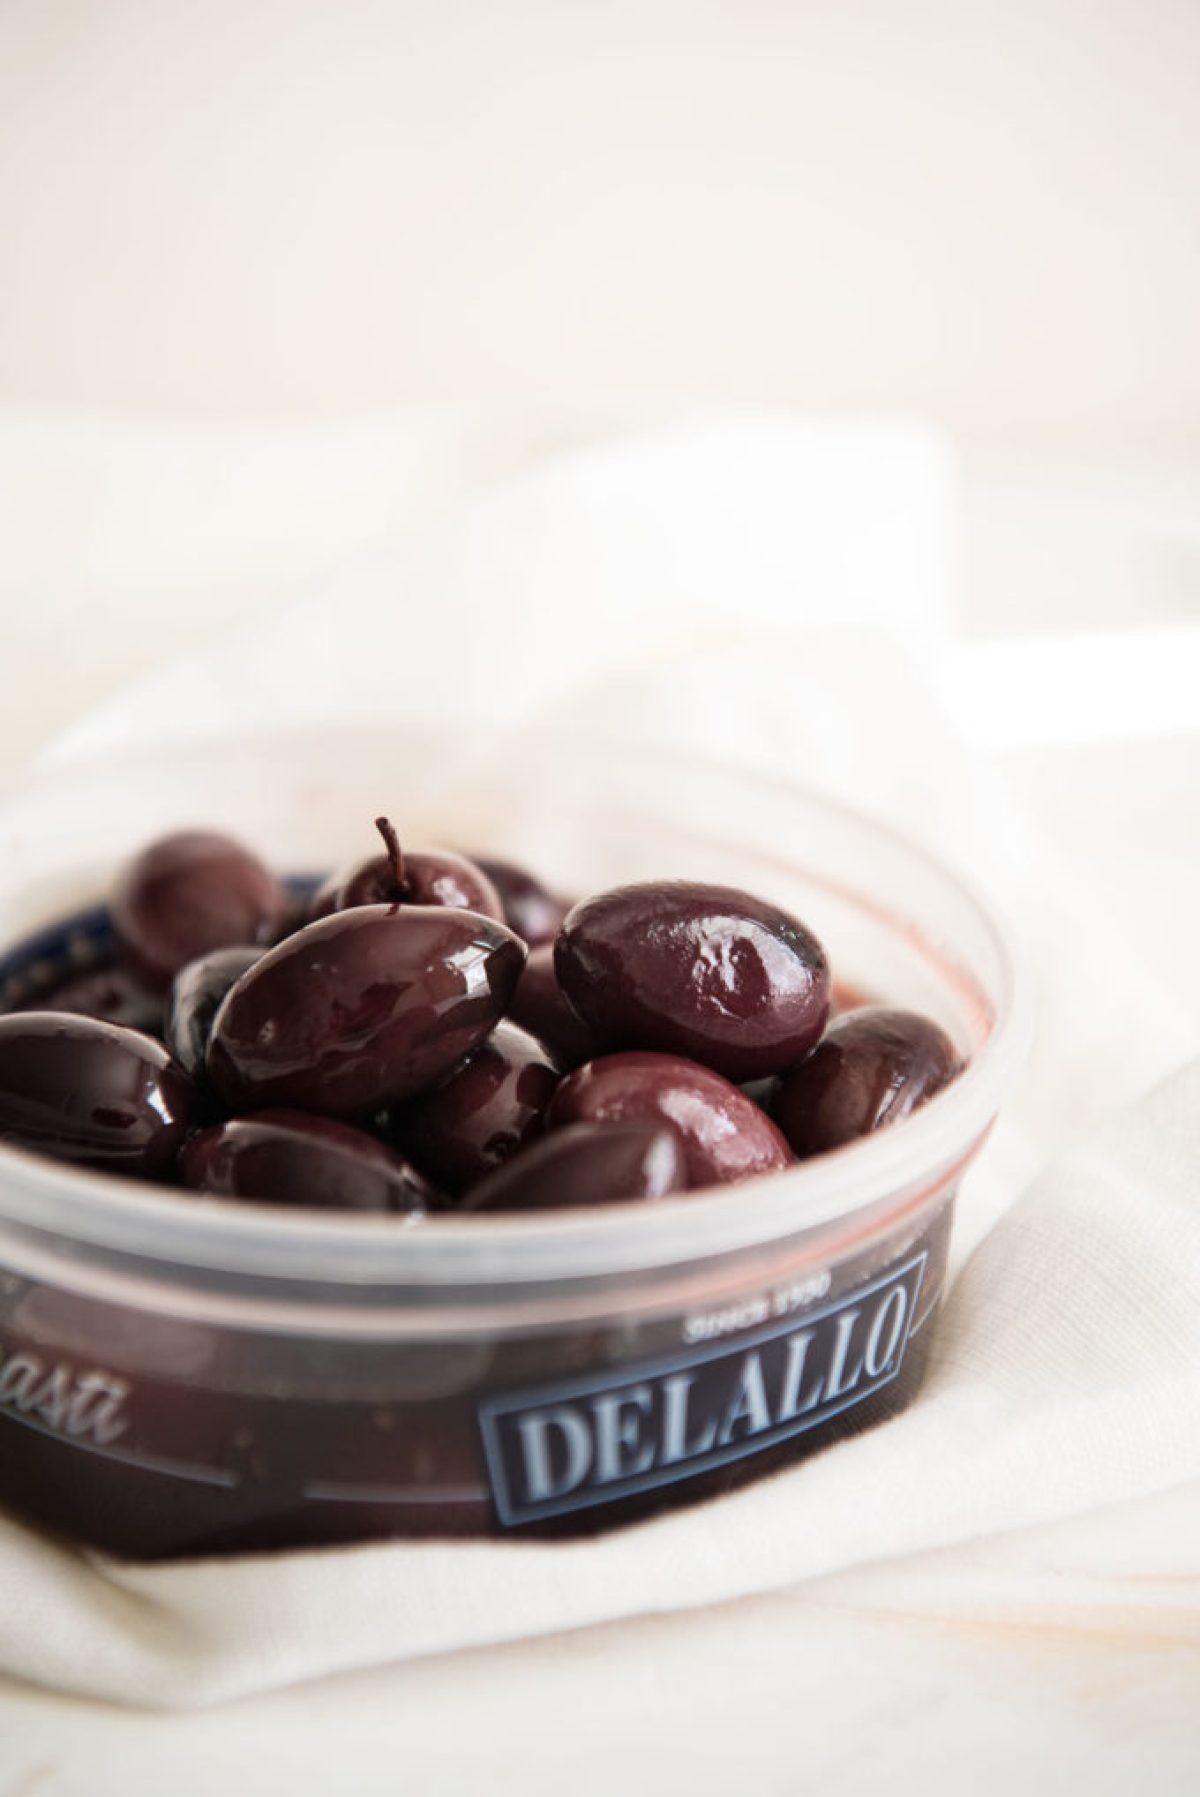 Delallo kalamata olives, greek salad